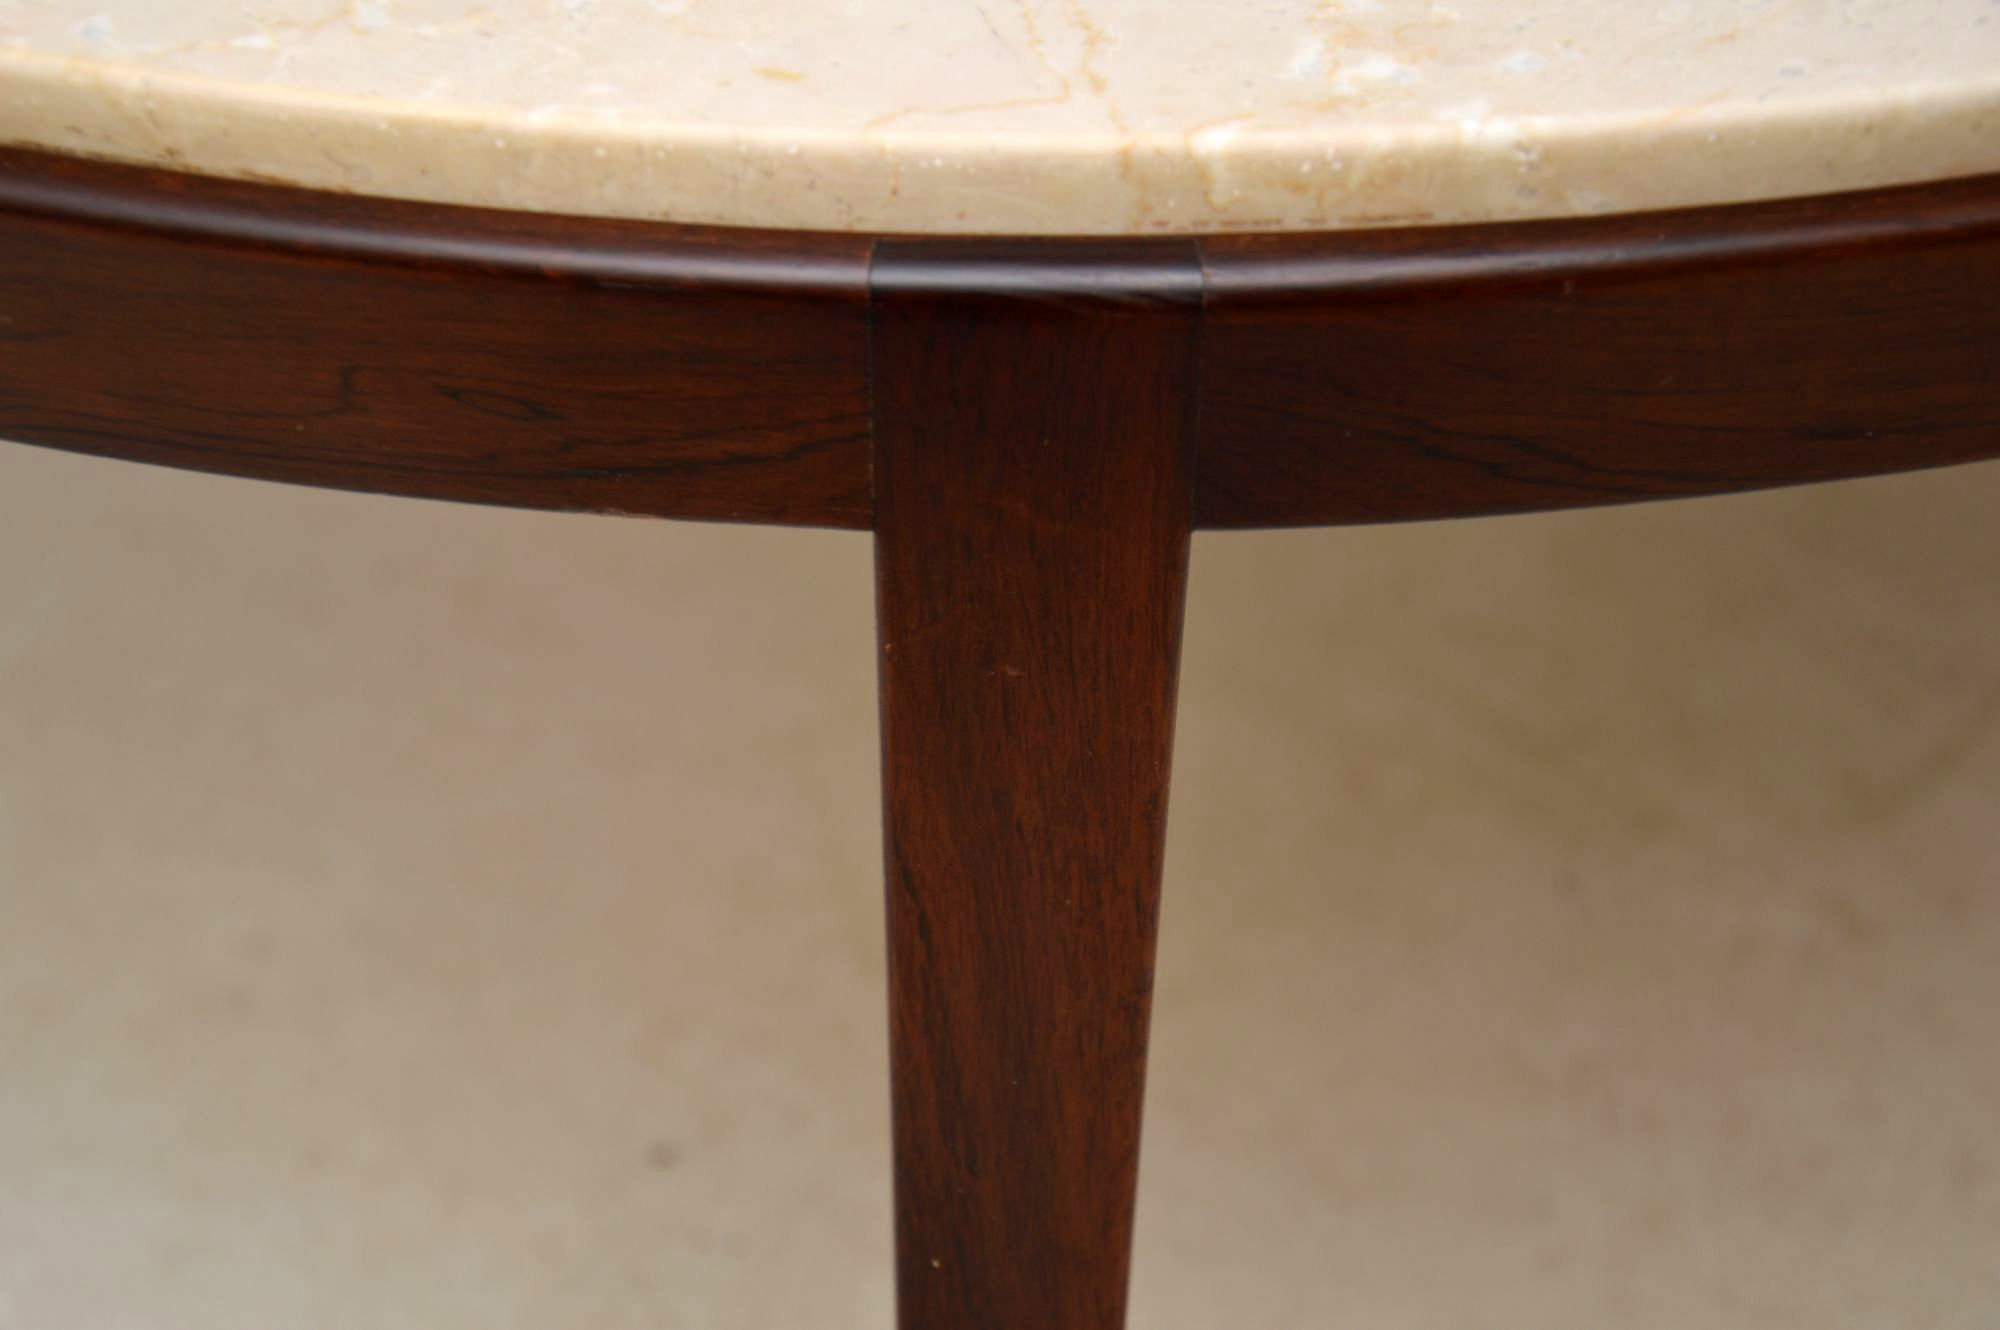 Danish Retro Rosewood Amp Marble Coffee Table Vintage 1960 S